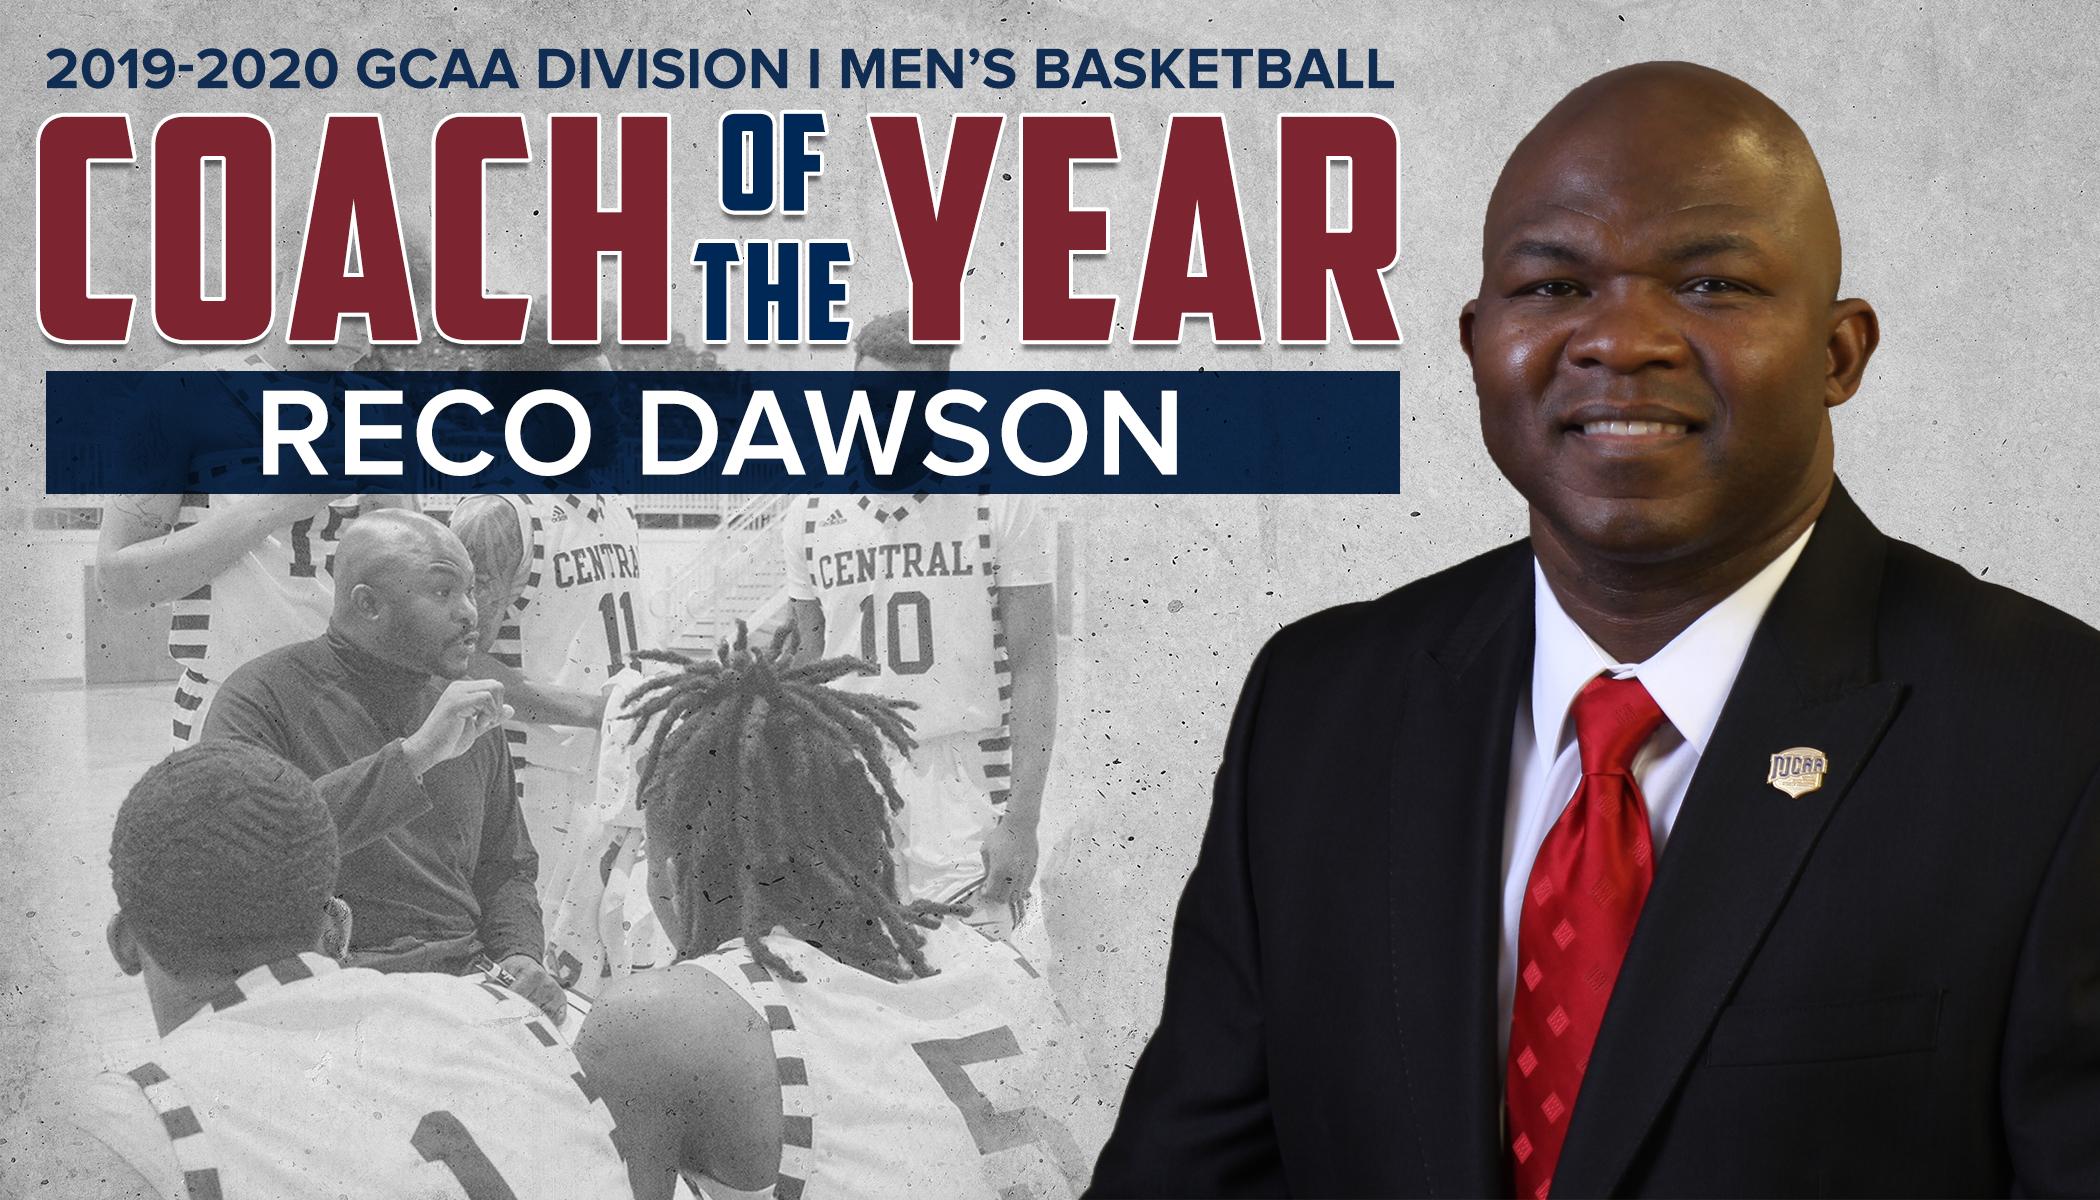 reco-dawson-gcaa-coach-of-the-year